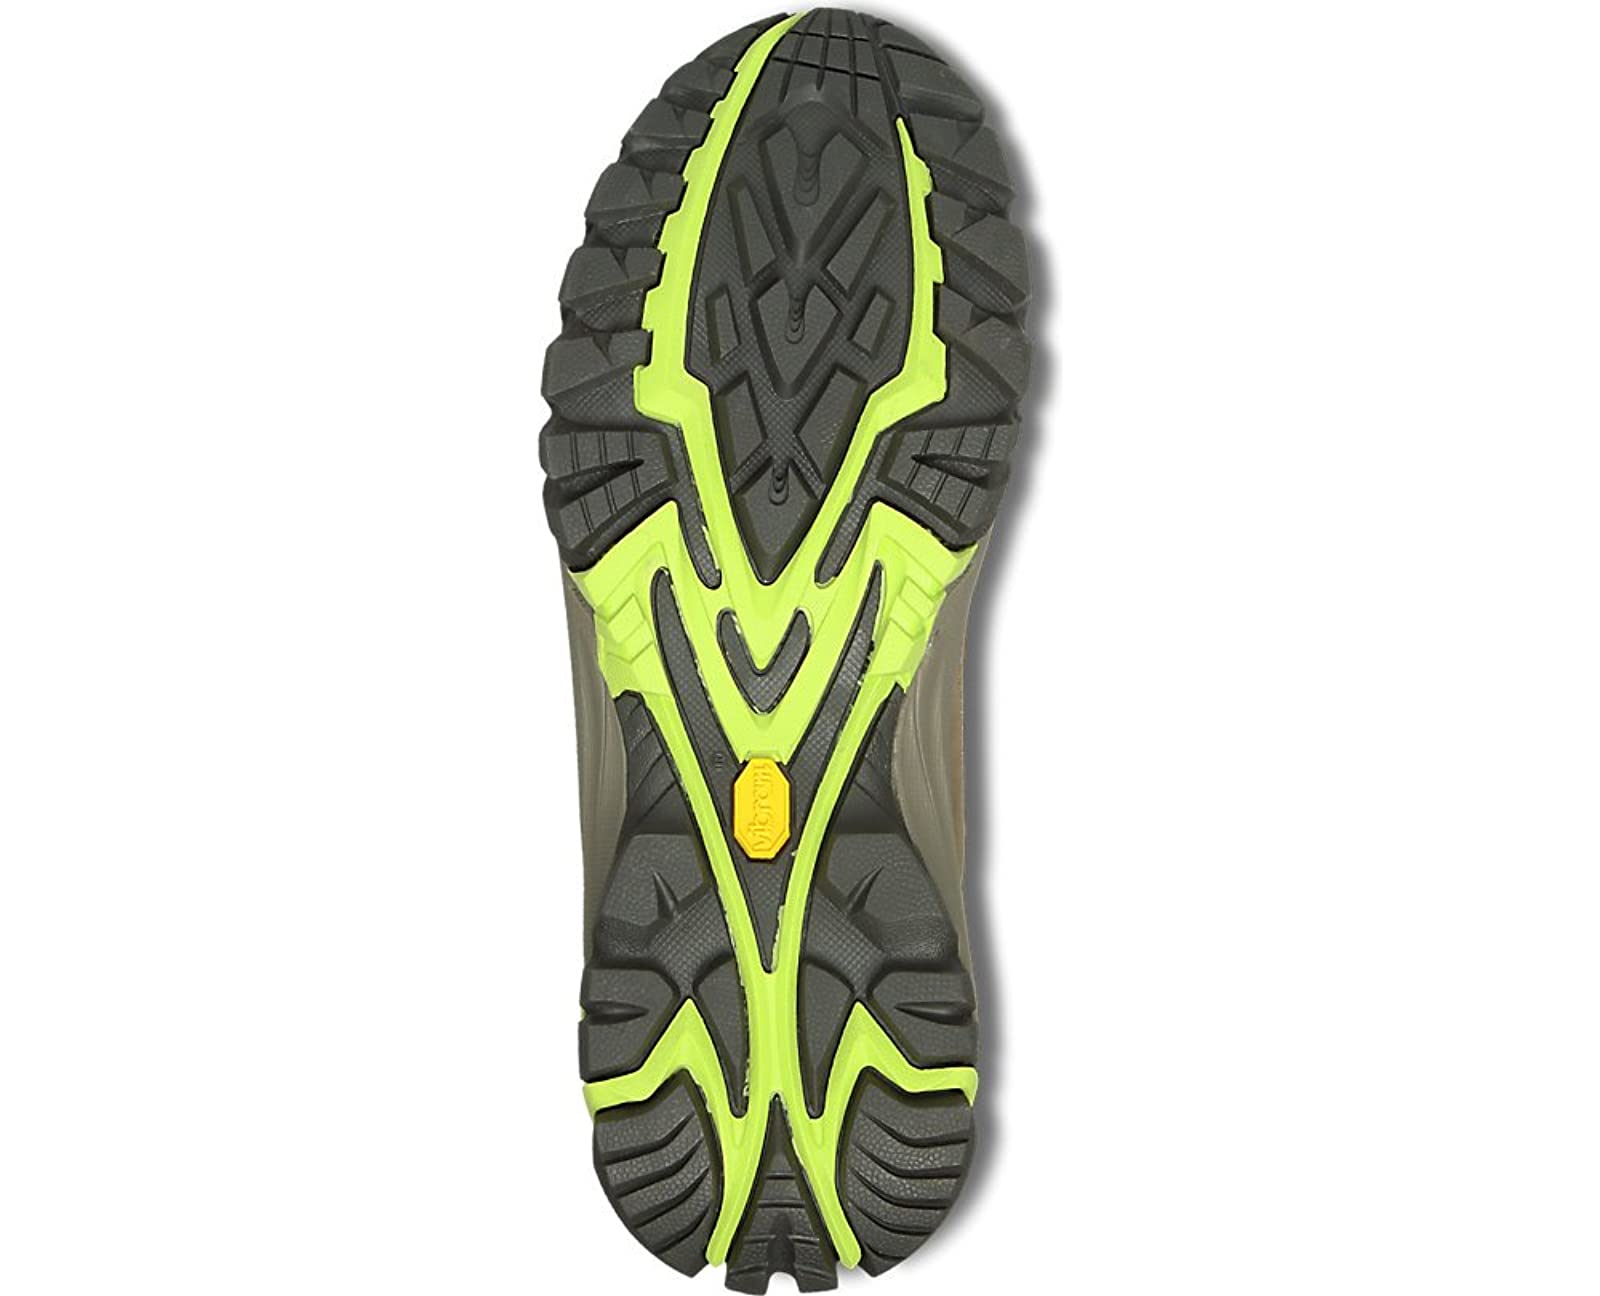 Vasque Women's Talus Trek UltraDry Hiking Boot US - 4